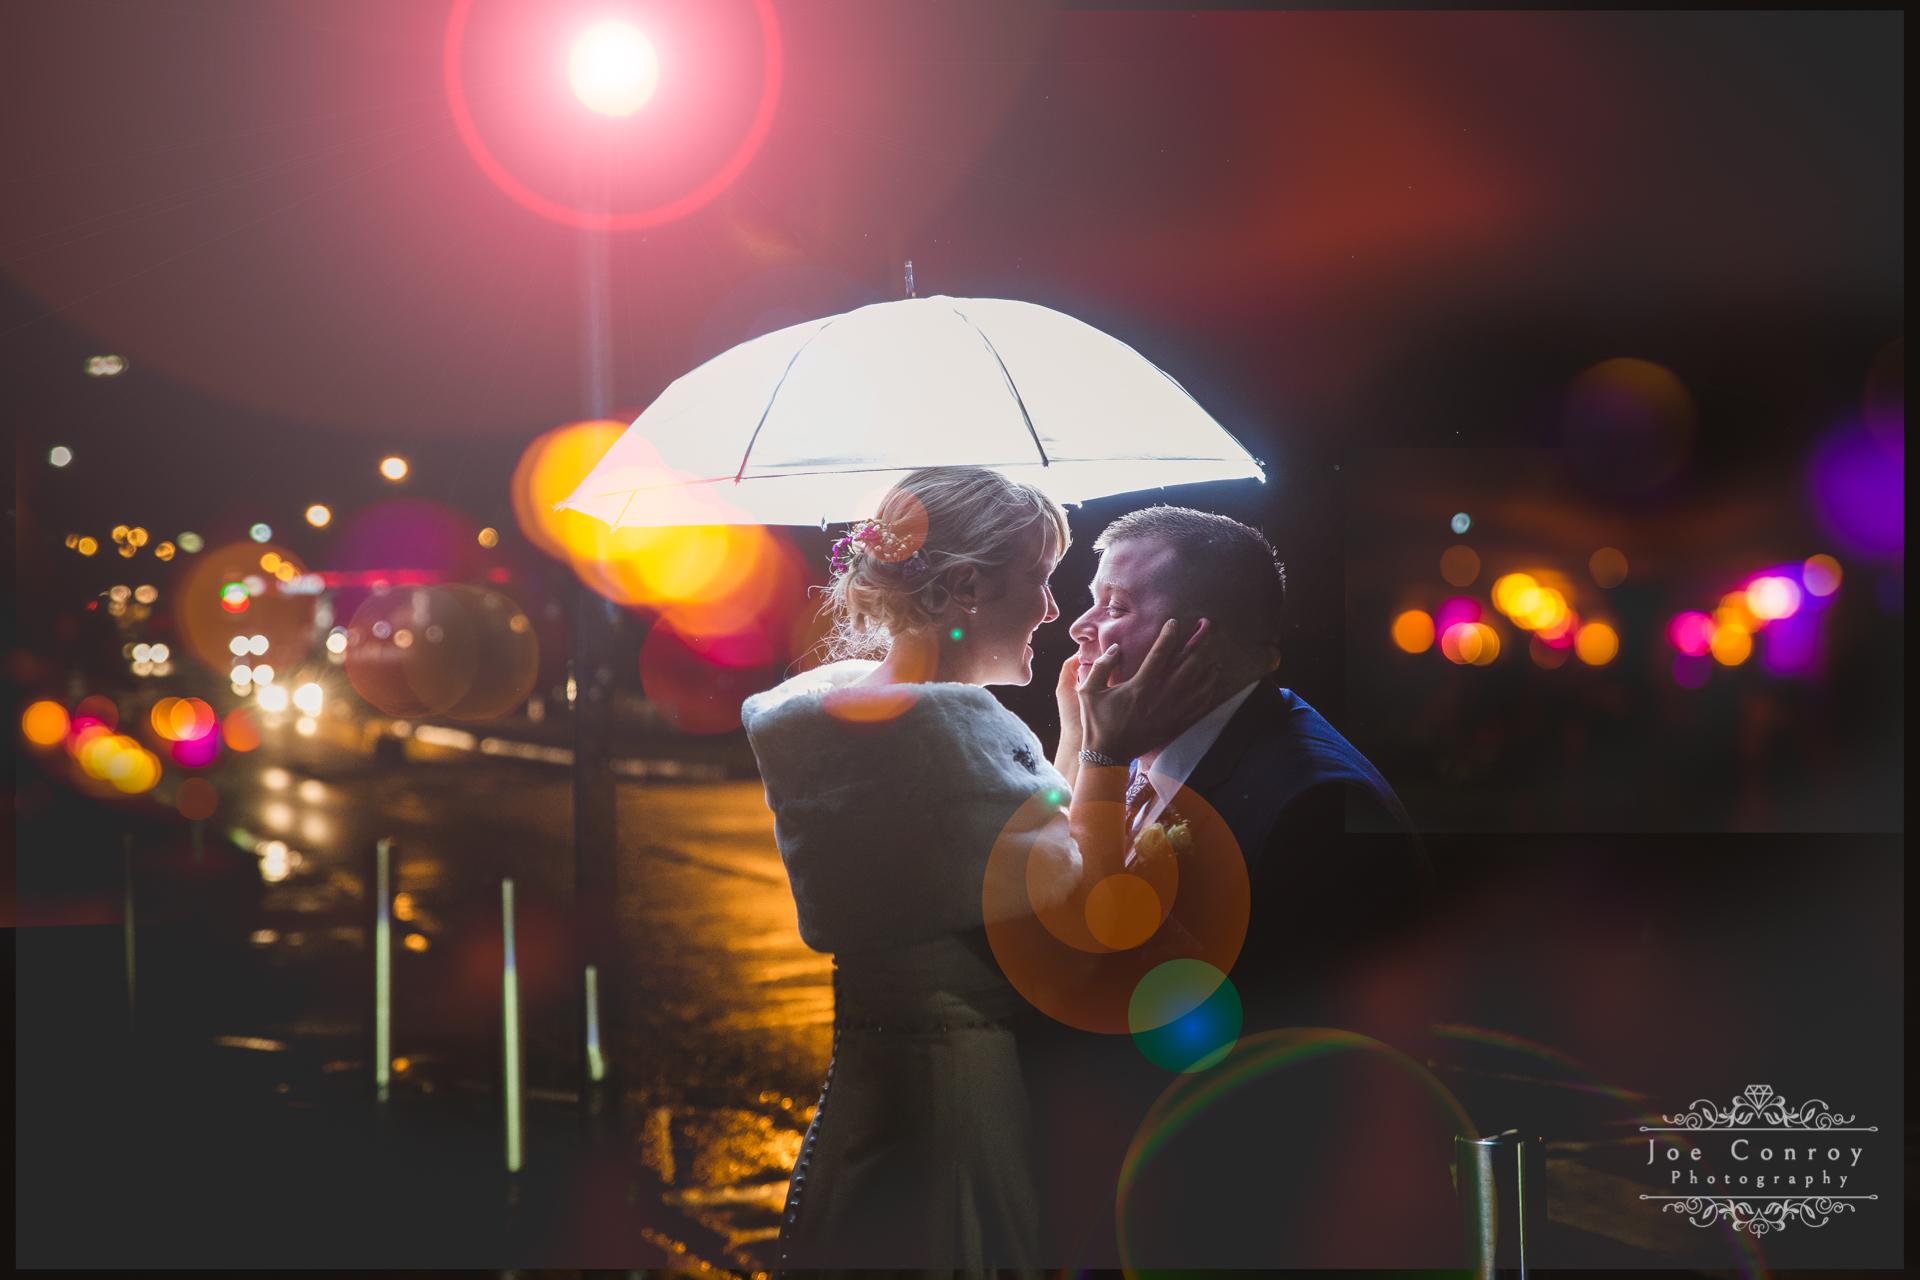 Danielle Keane & Tomas's wedding @ the Kileshin Hotel, Portlaoise